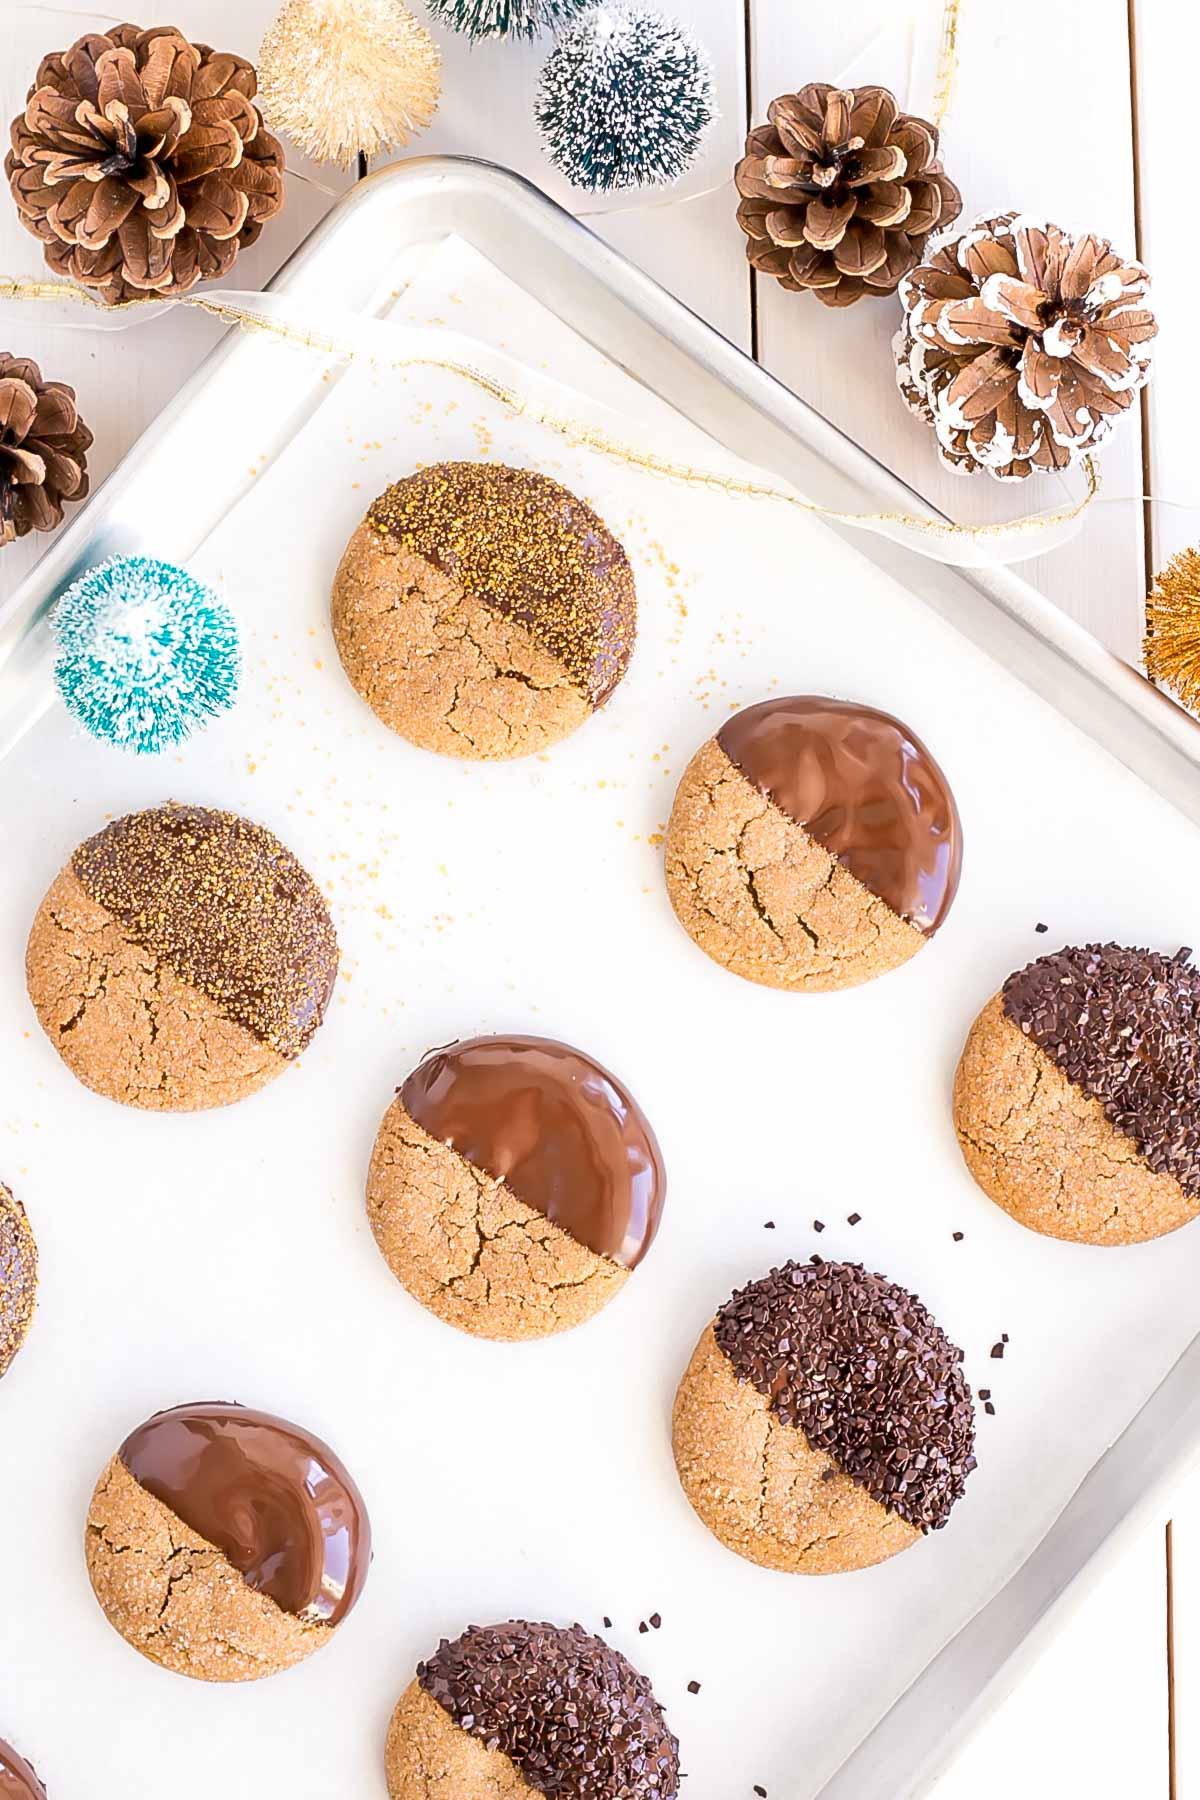 10 Yummy Gingerbread Cookies